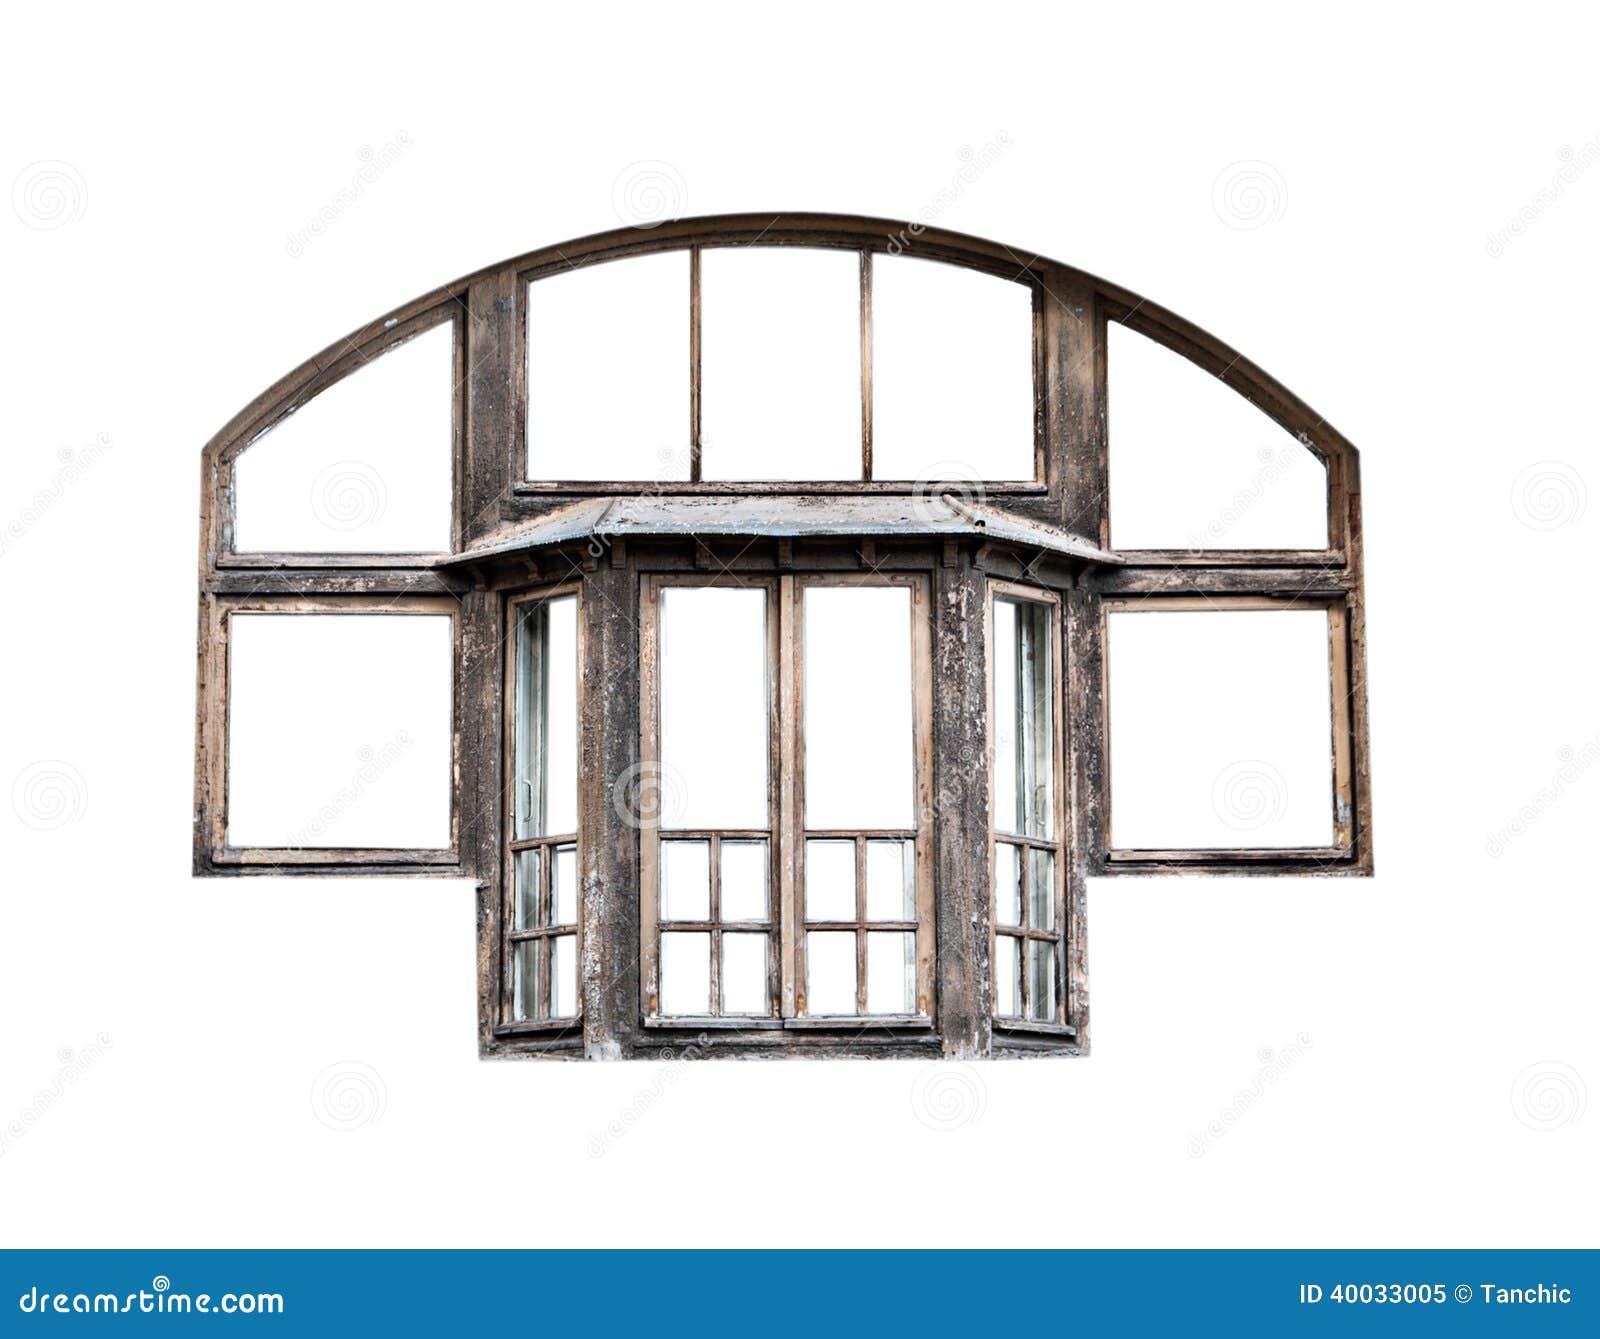 Old window frame isolated stock image. Image of frame - 40033005